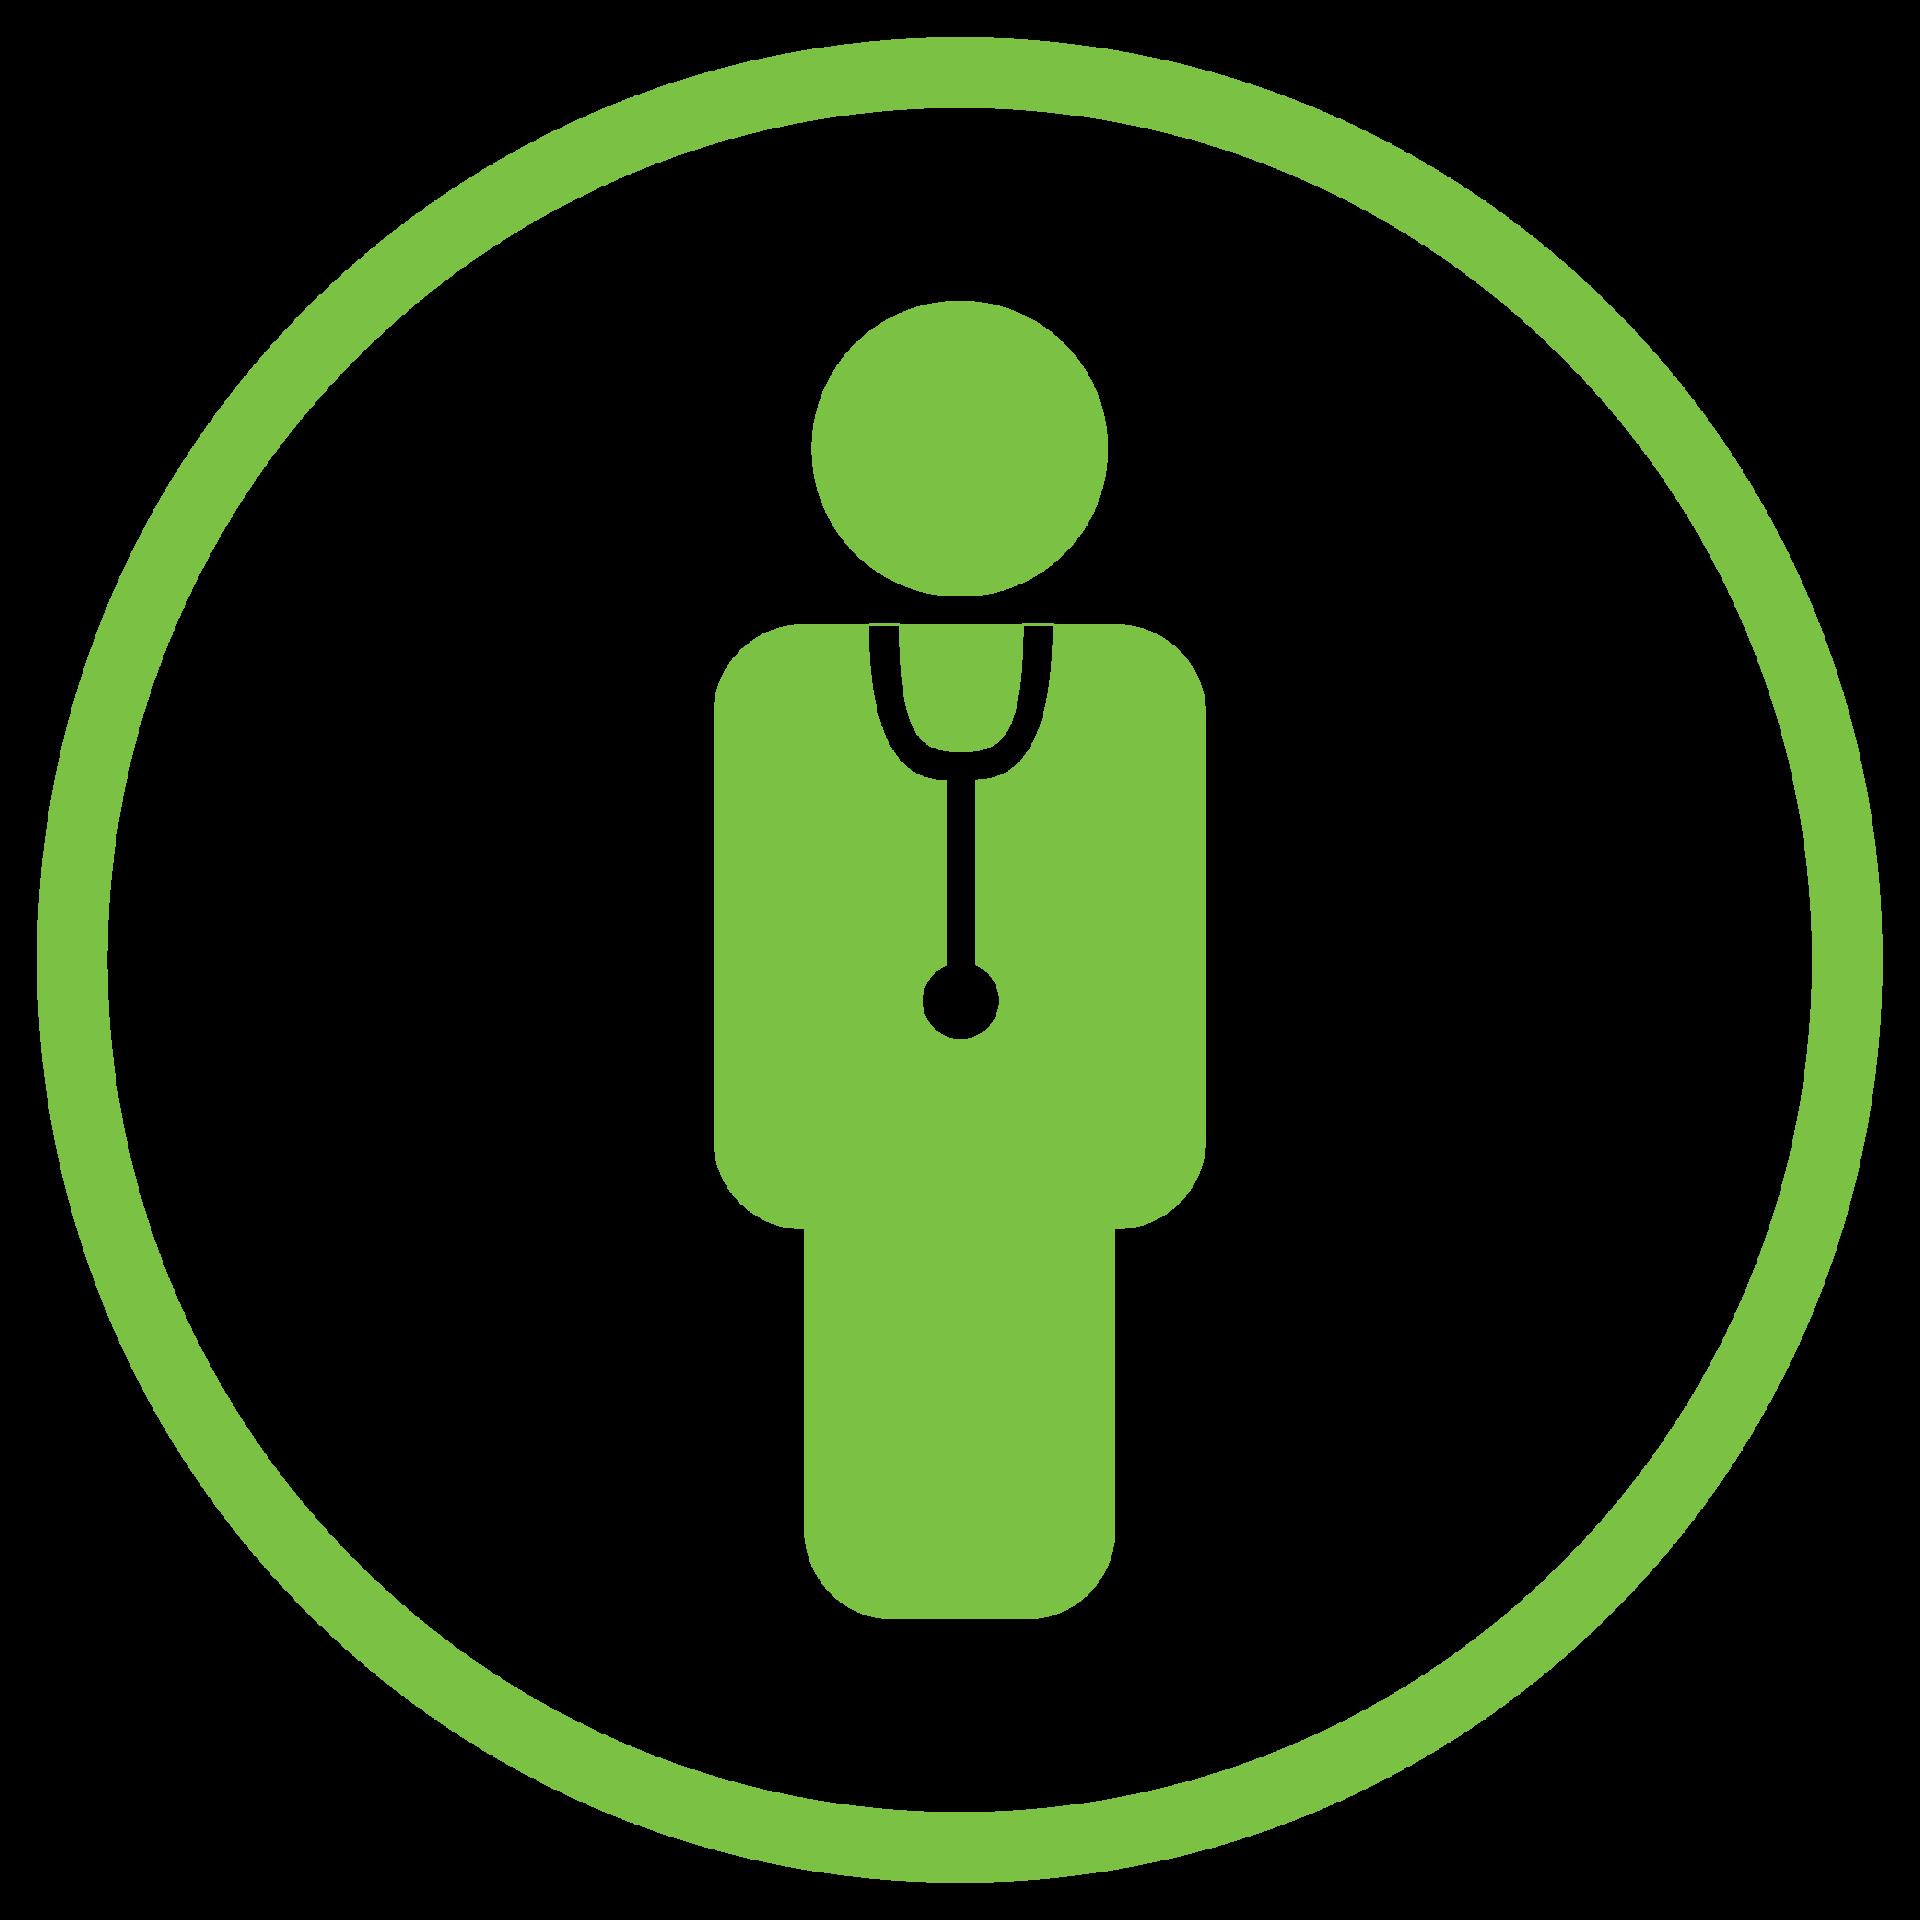 AmbulatoryIcon_Clinicians_green_medical staff